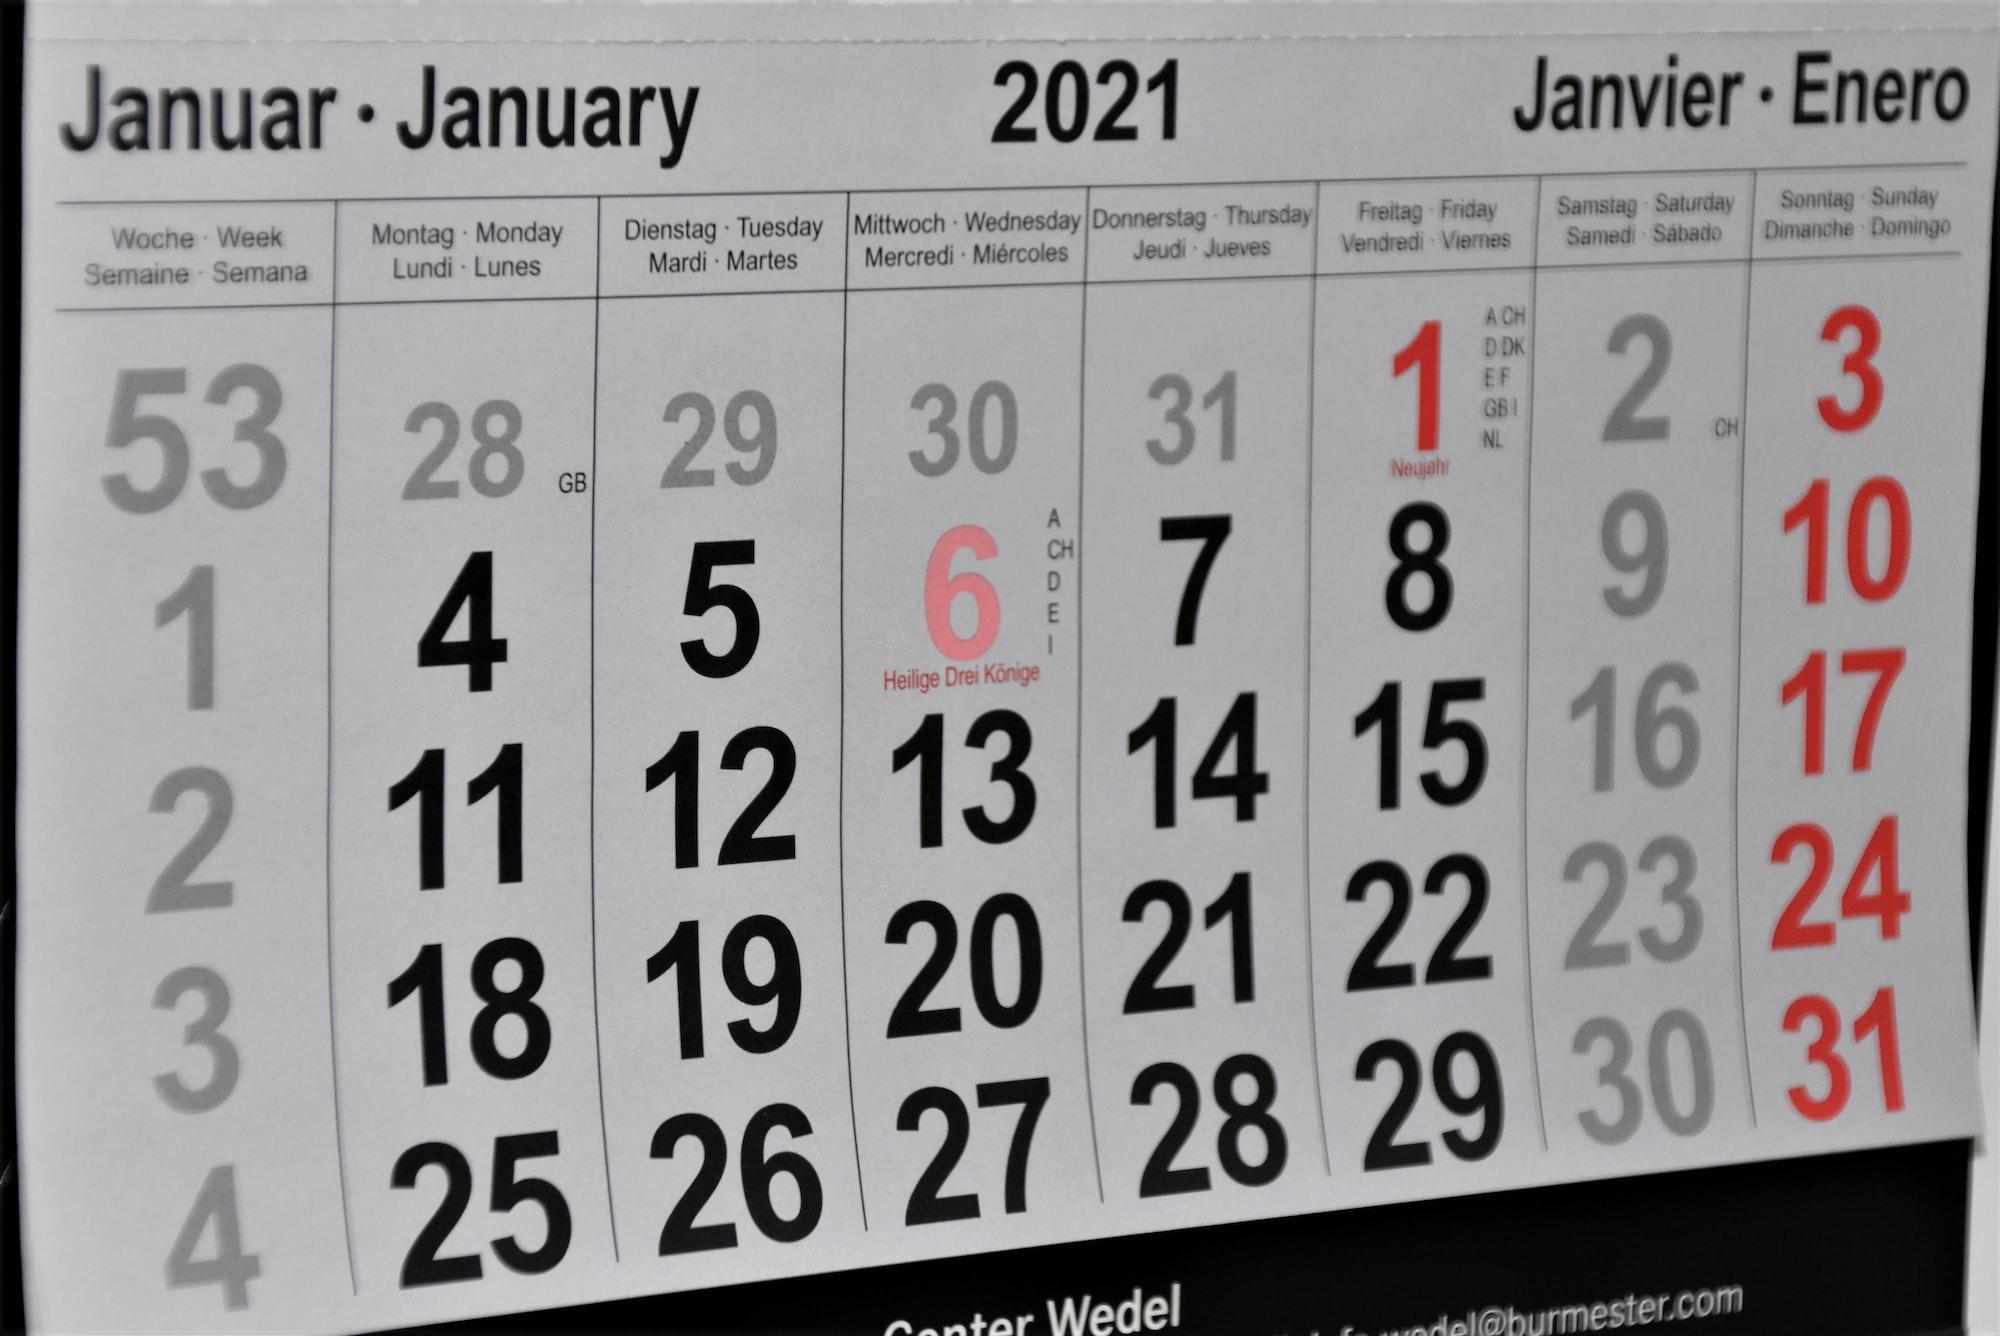 Monthly Progress Report - January, 2021